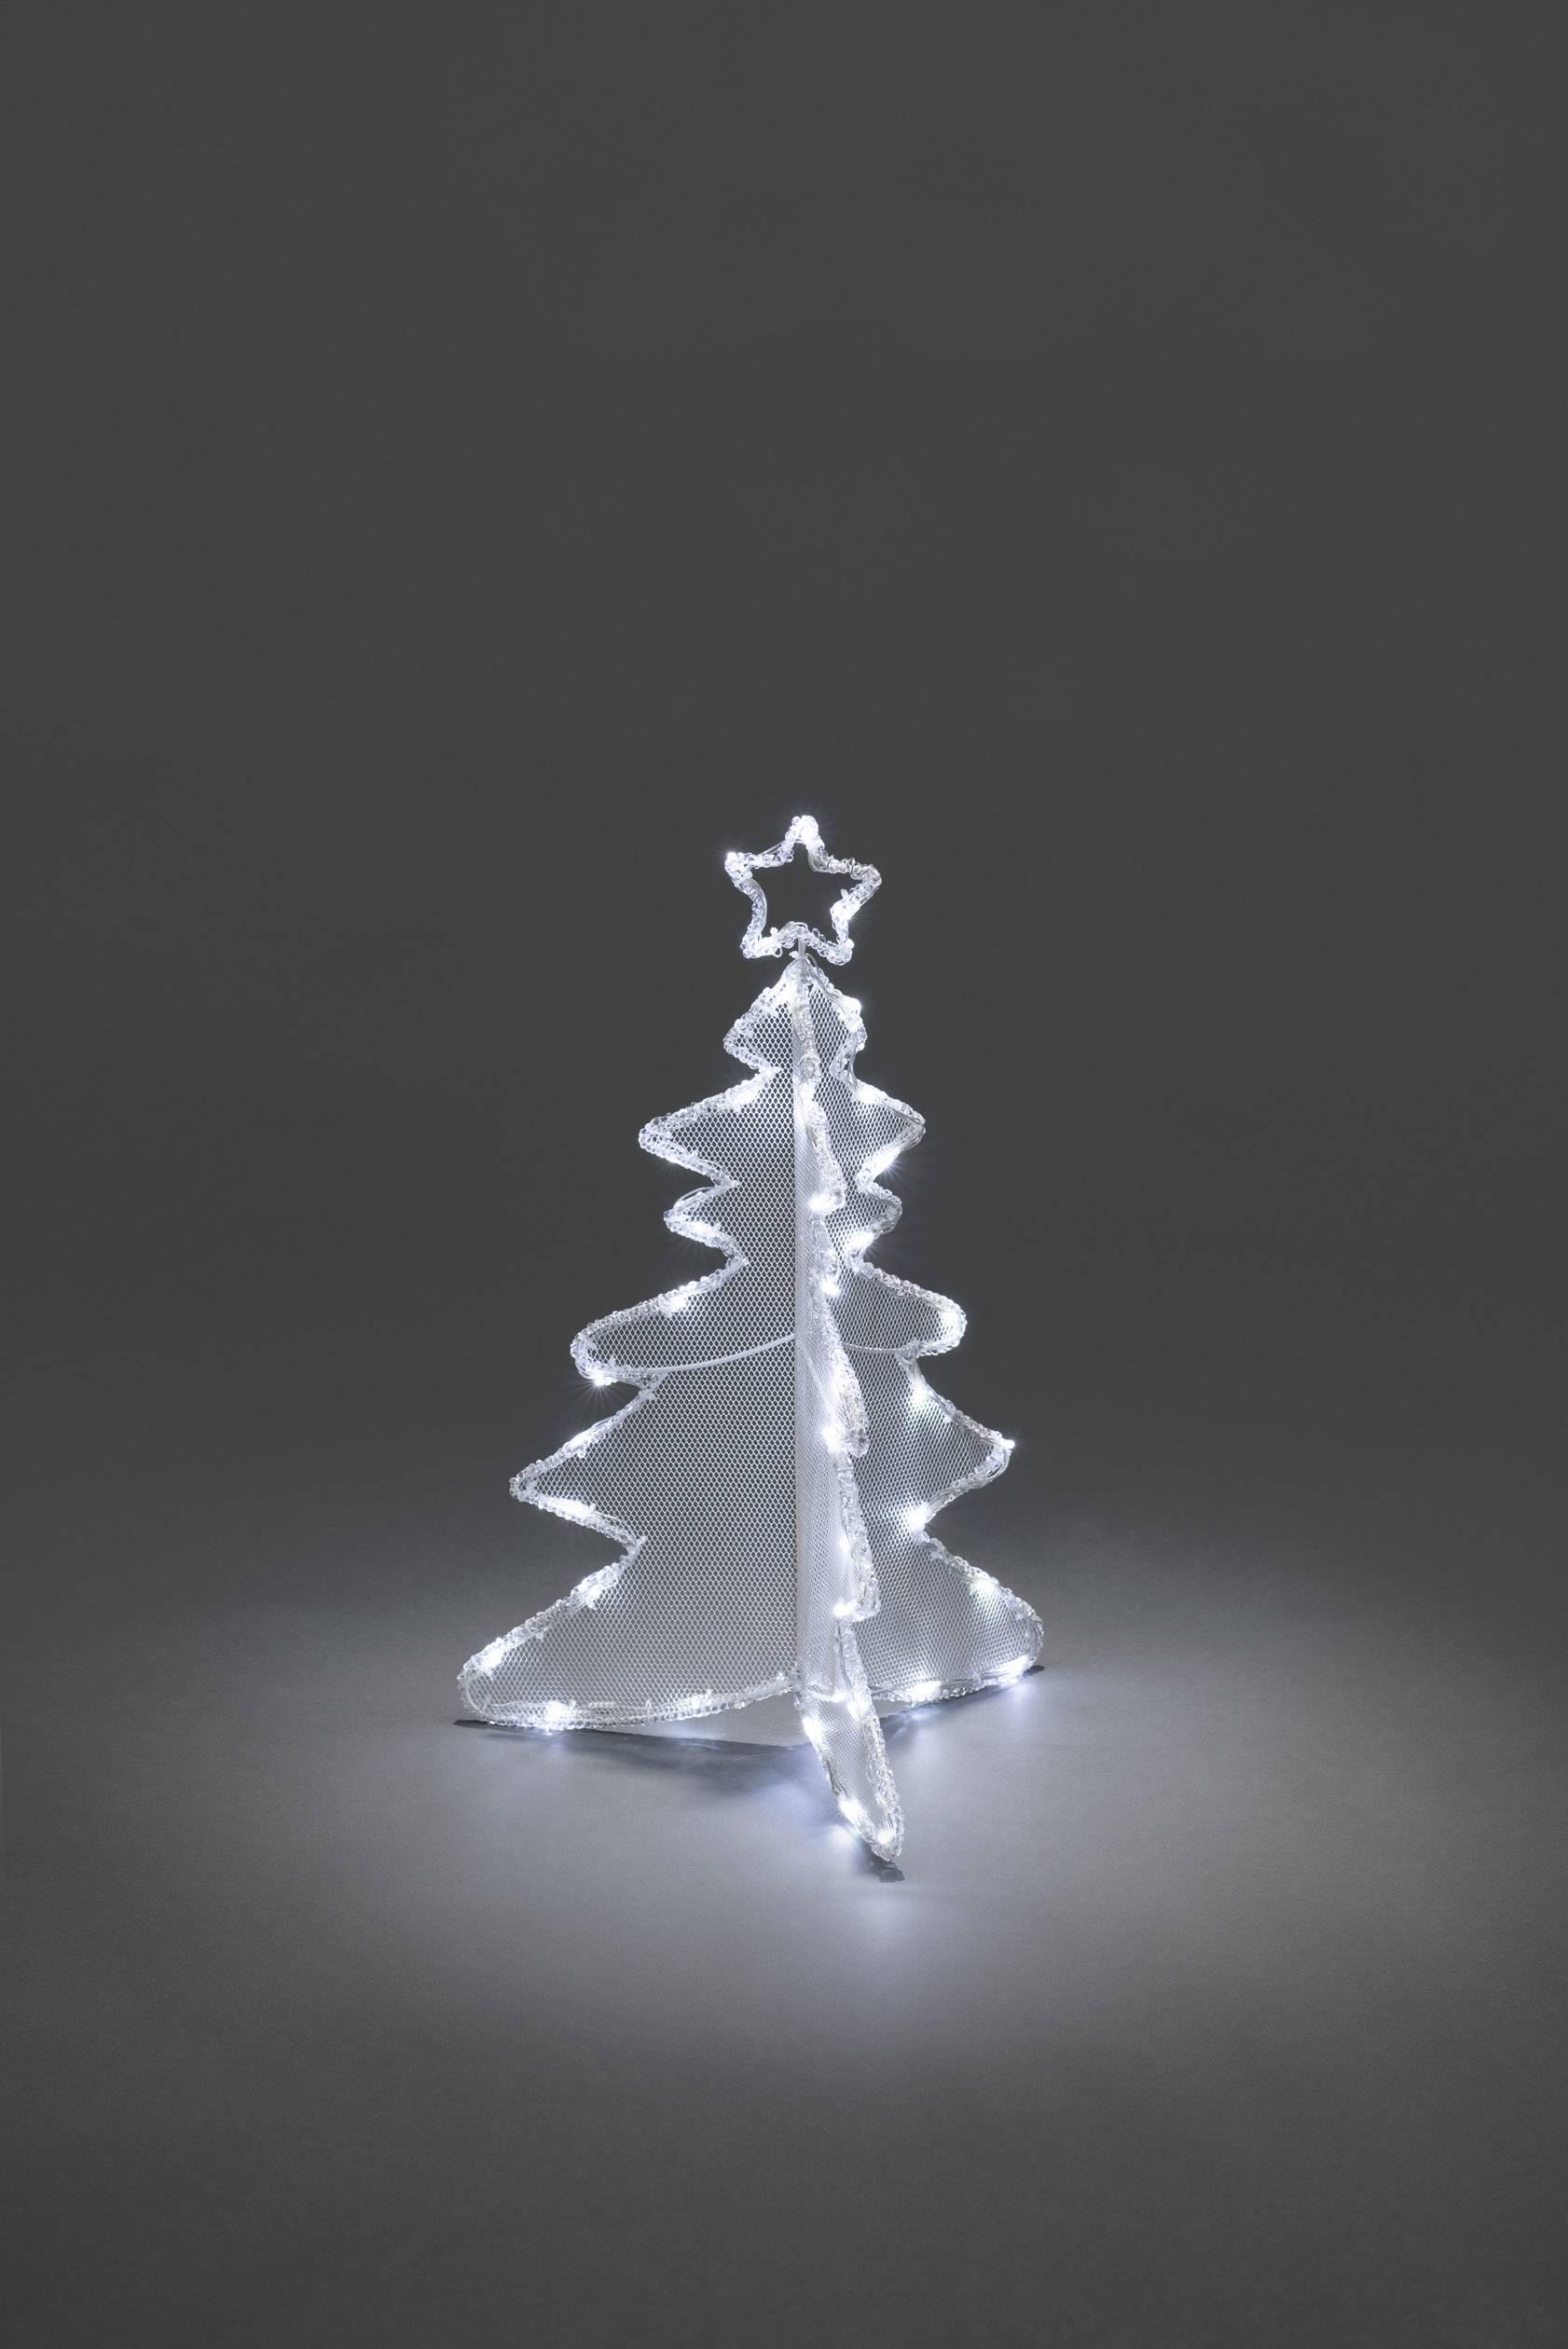 Acryl Figuur Energielabel A A E Kerstboom Koud Wit Led